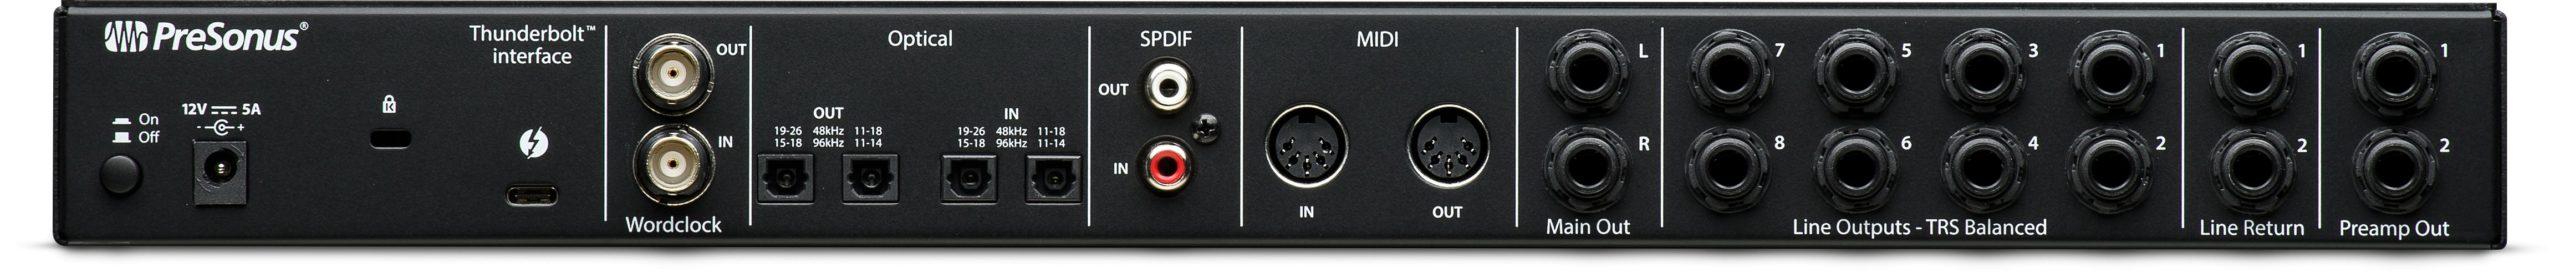 Аудиоинтерфейс PreSonus Quantum 2626 Thunderbolt 3